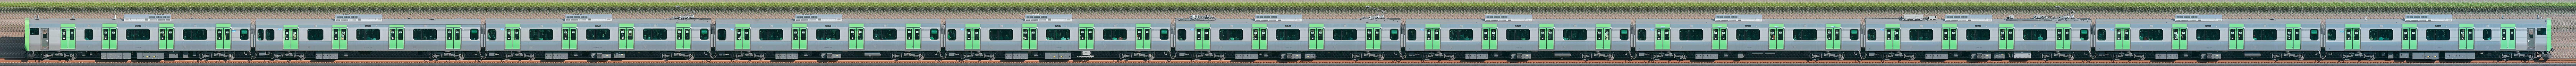 JR東日本 山手線 E235系トウ12編成(架線状態監視装置搭載編成)の編成サイドビュー